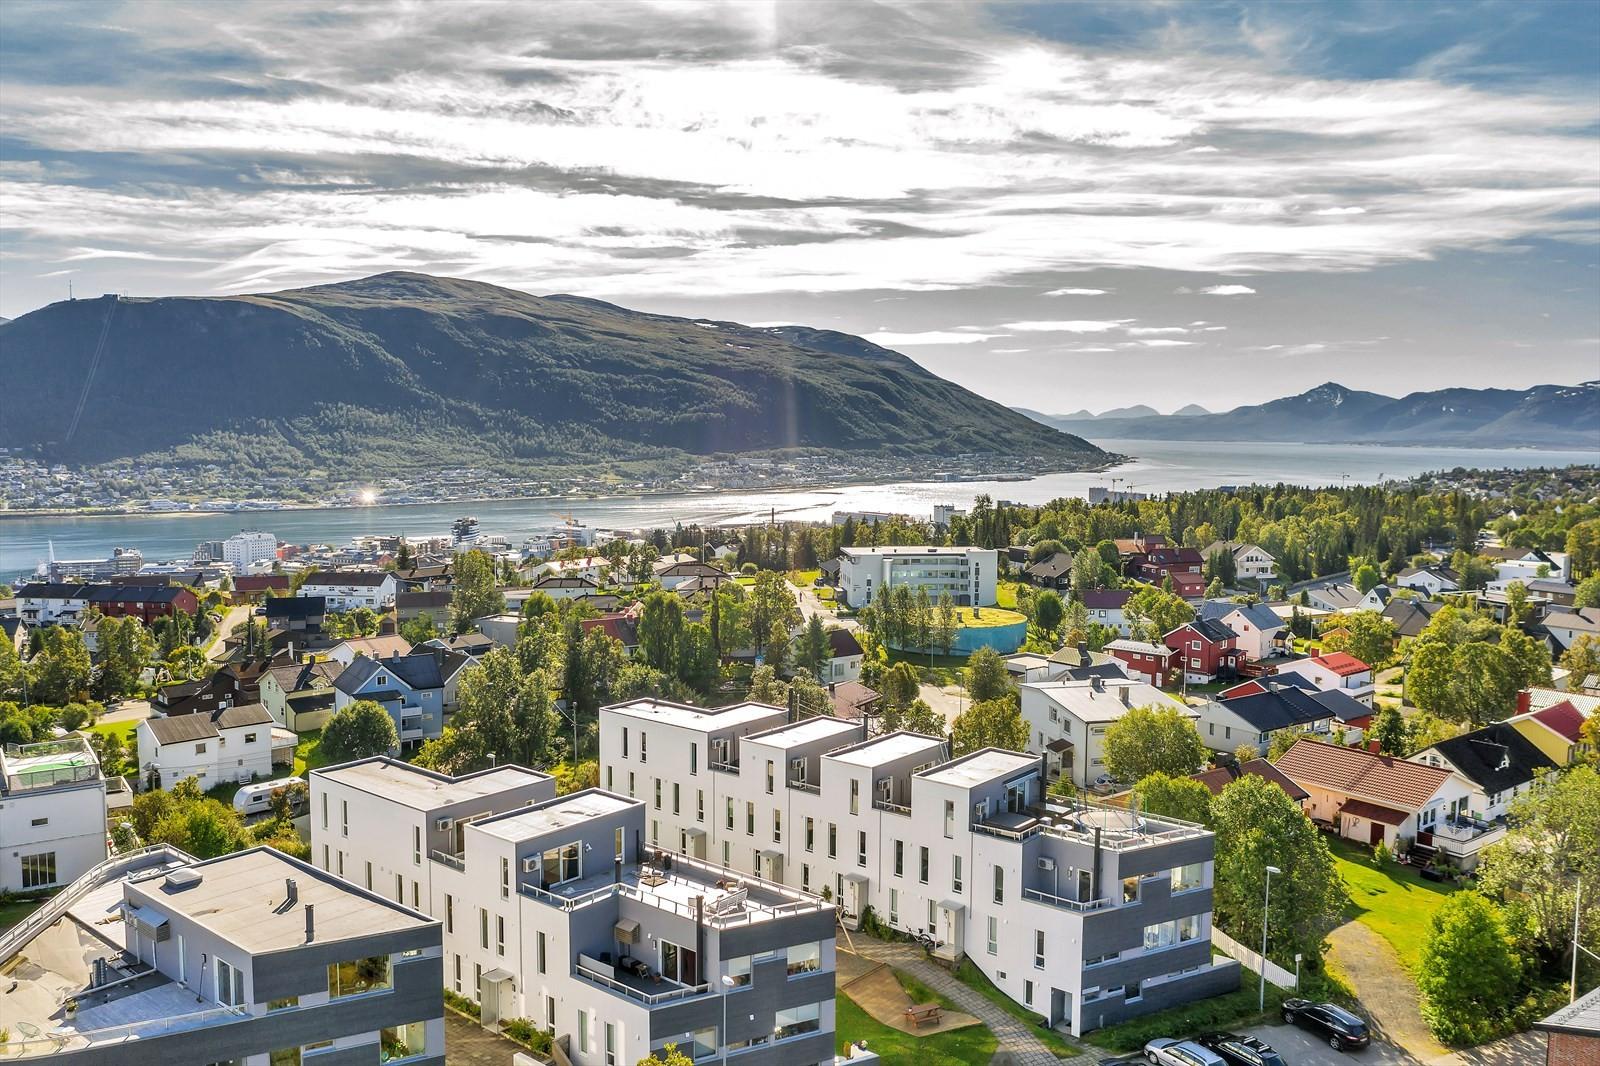 Meget attraktiv beliggenhet på toppen av Tromsøya i ett rolig boområde.